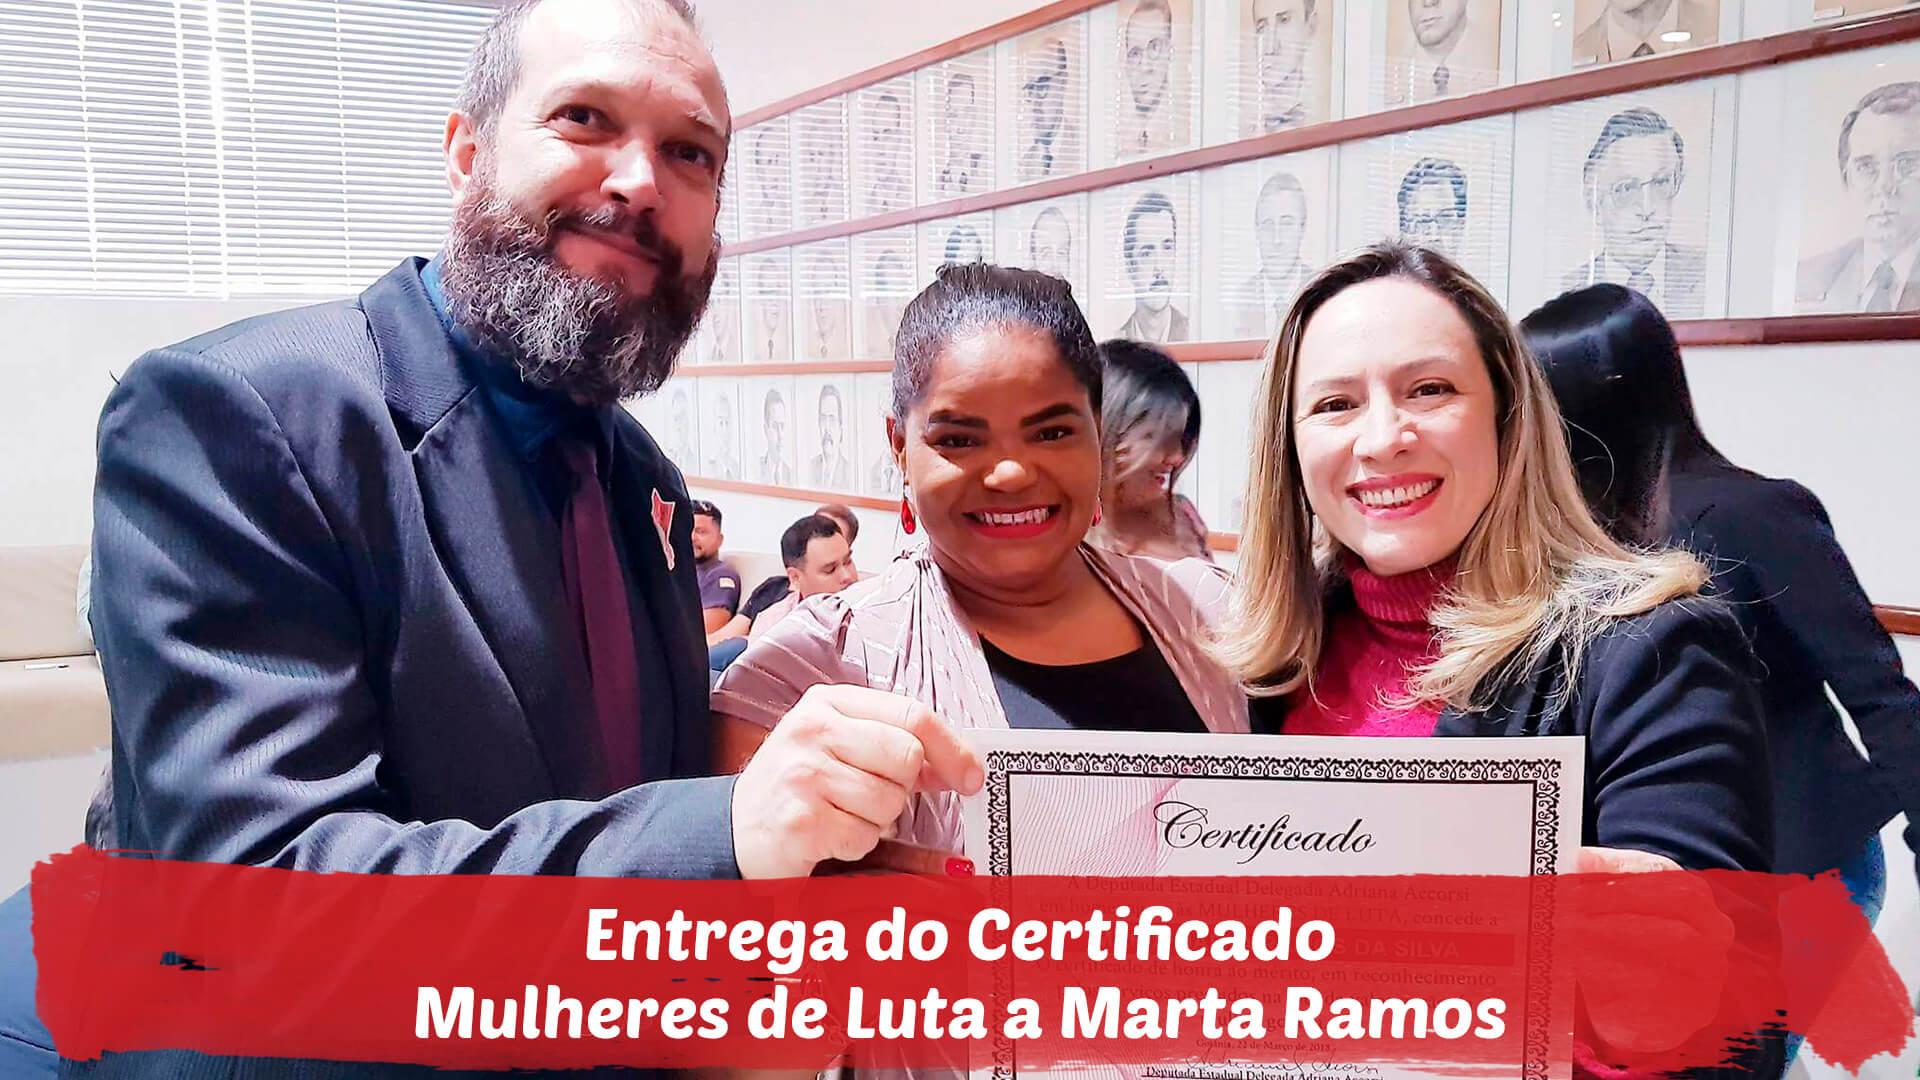 Visita de Marta Ramos e entrega do Certificado Mulheres de Luta